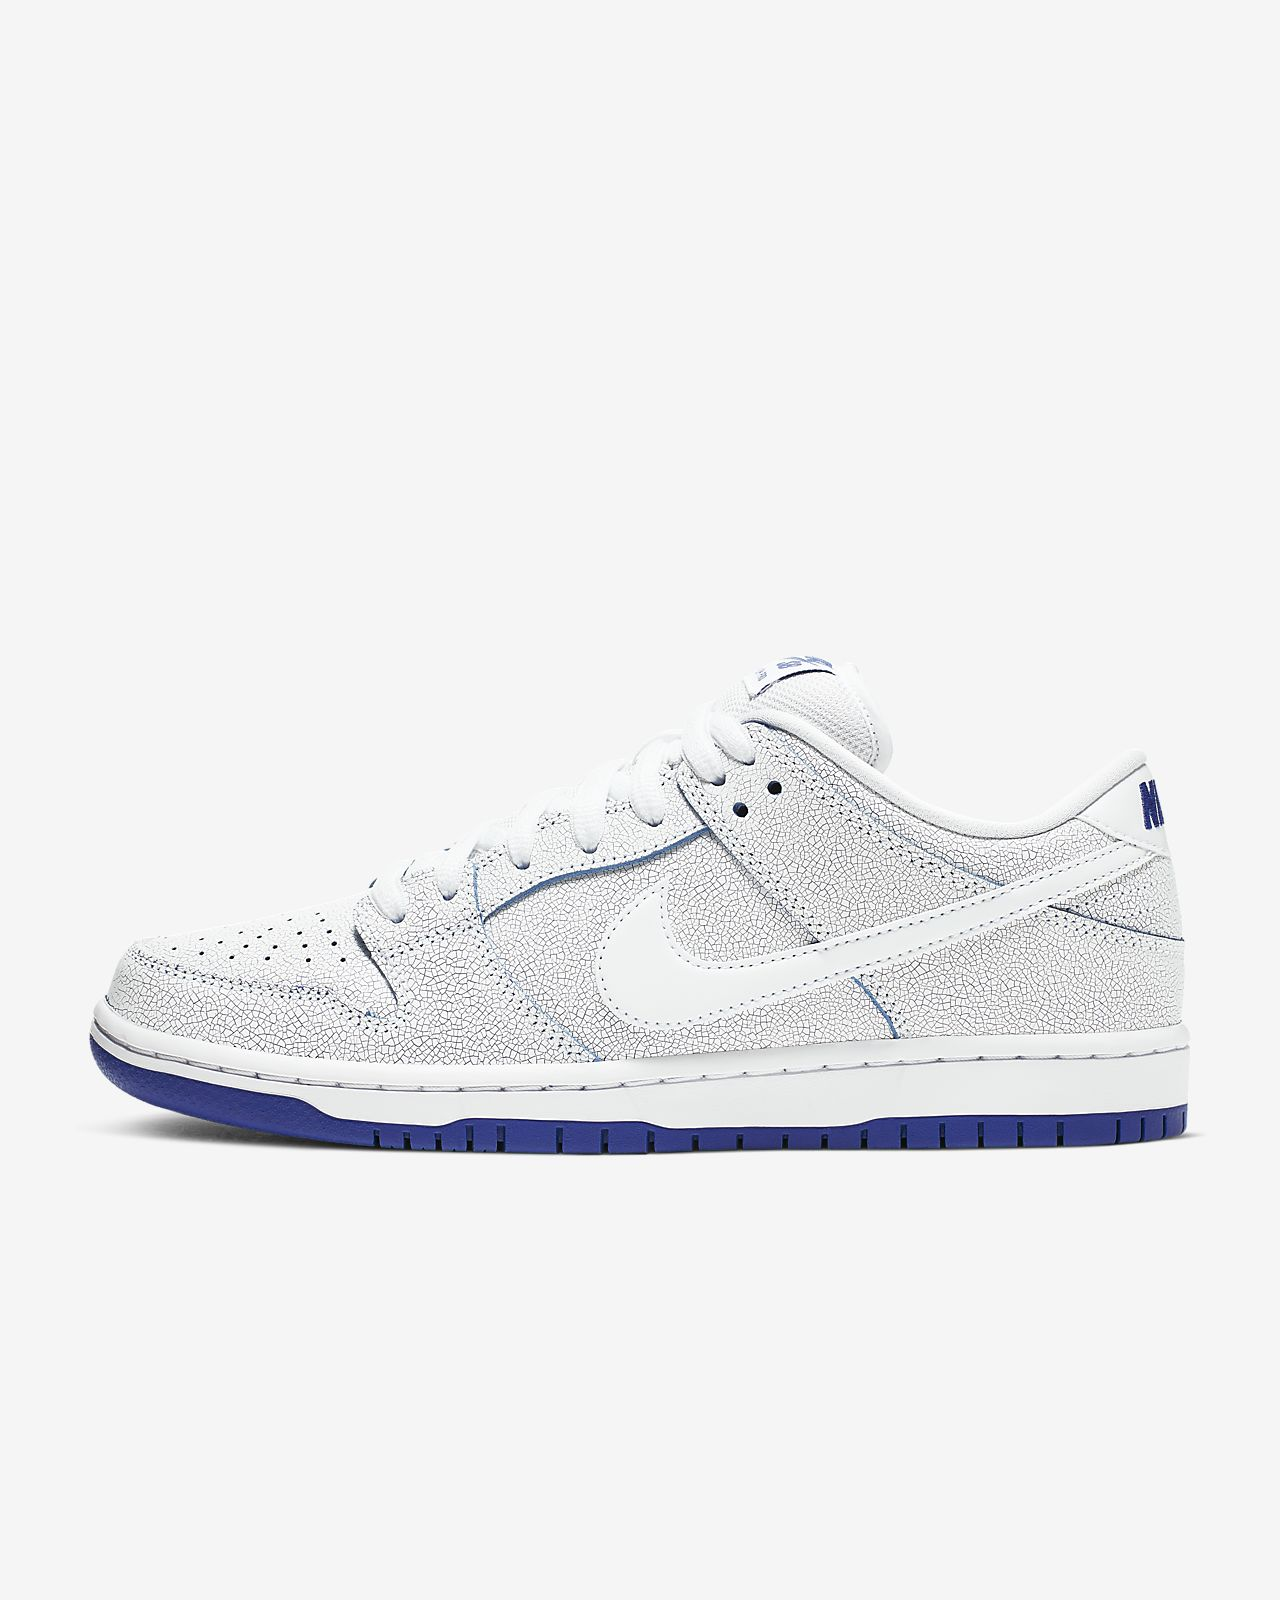 buy online 09ee2 772a4 Nike SB Dunk Low Pro Premium Skate Shoe